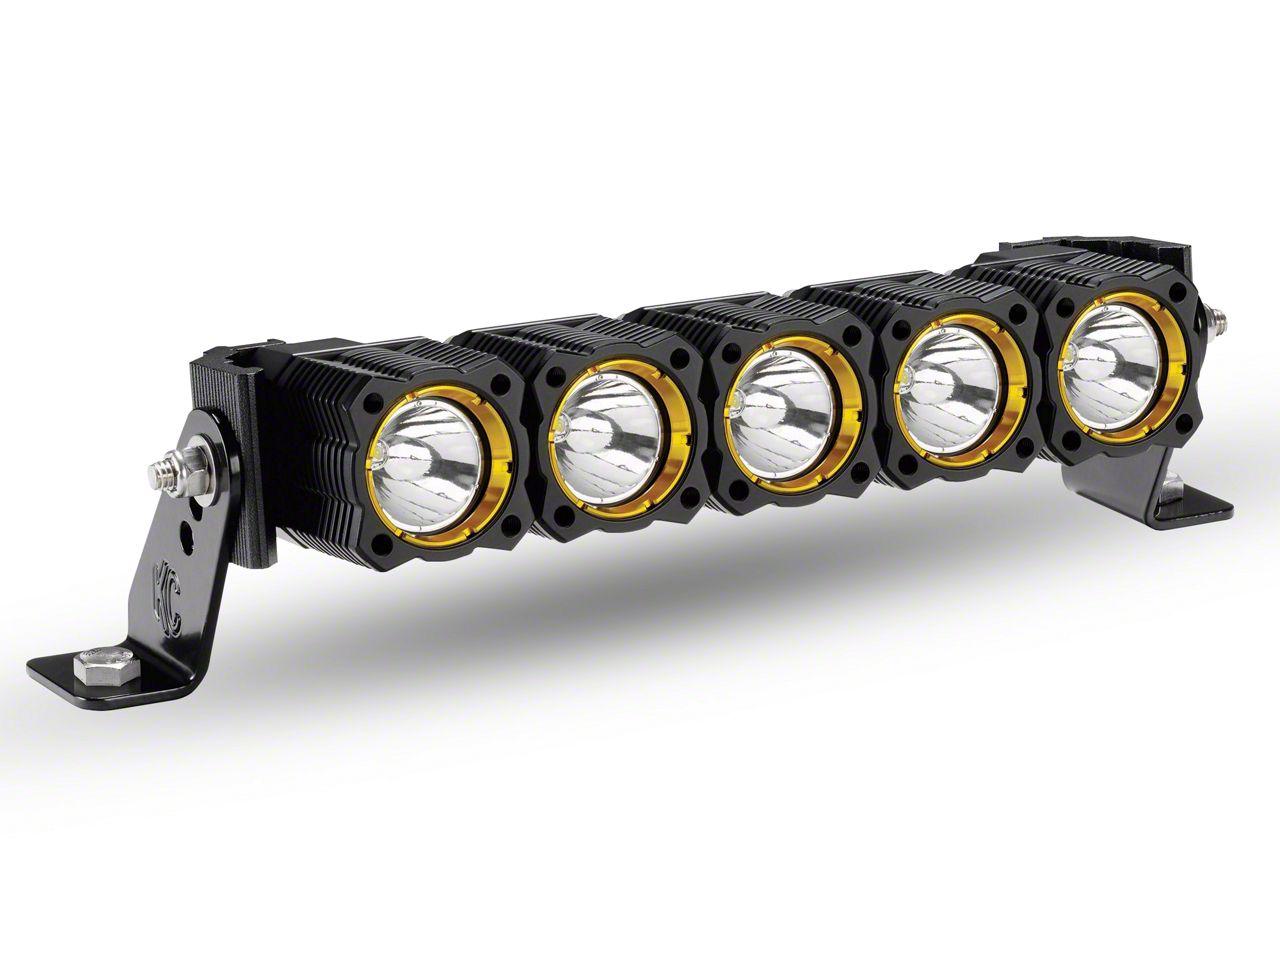 KC HiLiTES 30 in. Flex Array LED Light Bar - Combo Beam